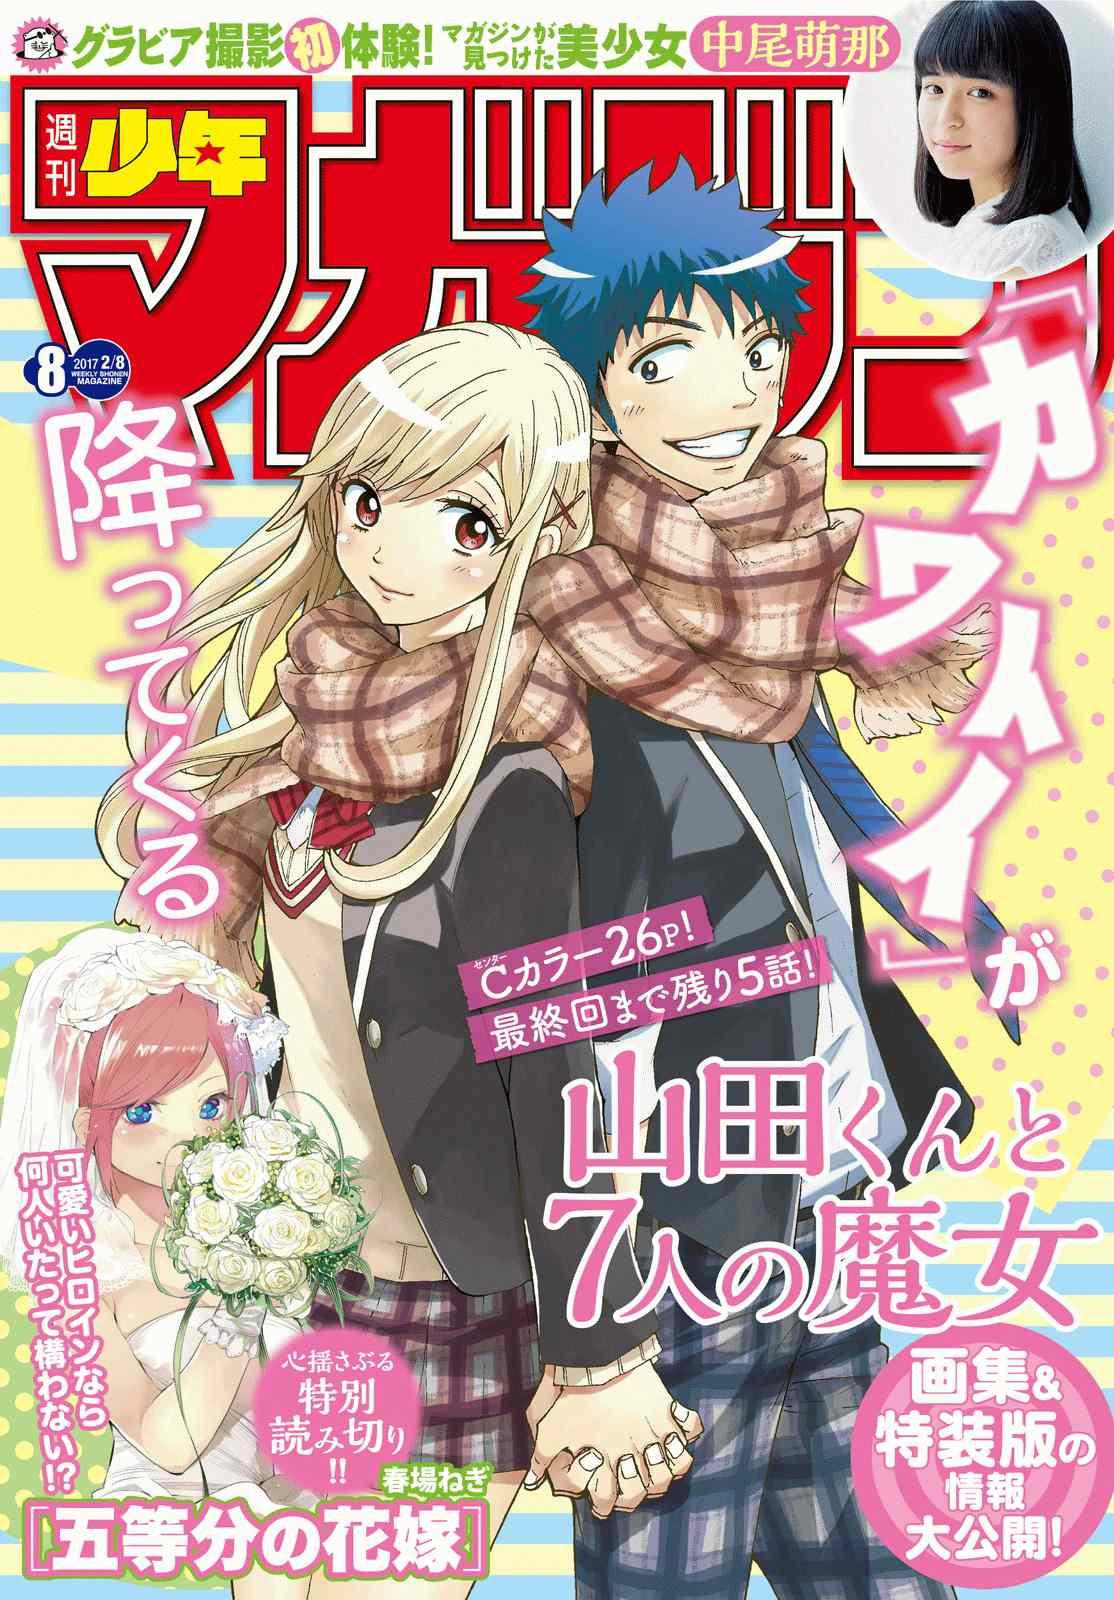 Yamada-kun_to_7-nin_no_Majo Chapter 239 Page 1